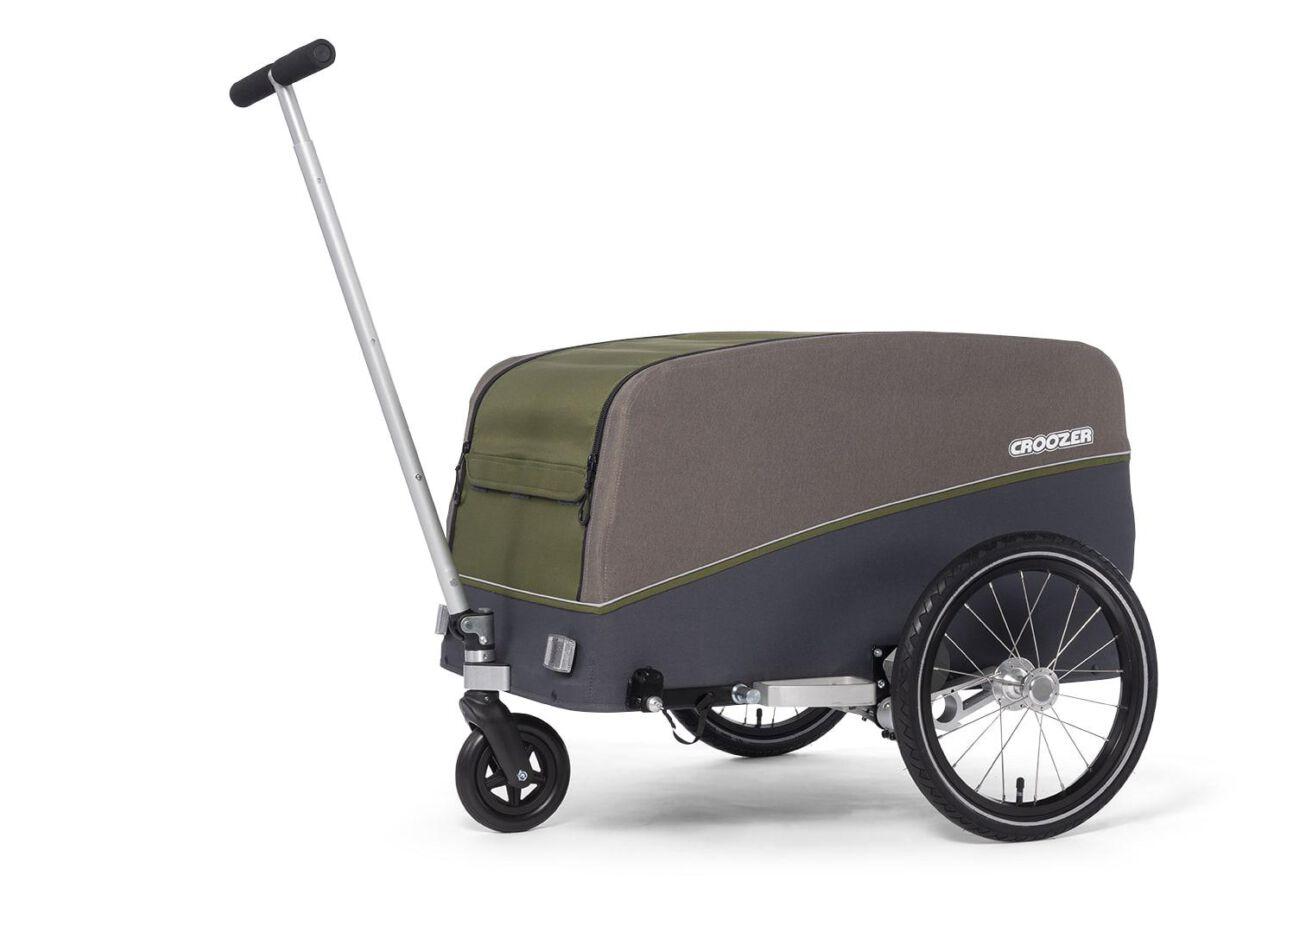 121008320 Croozer Cargo Tuure Bollerwagen 01 Olive Green 2020 Web